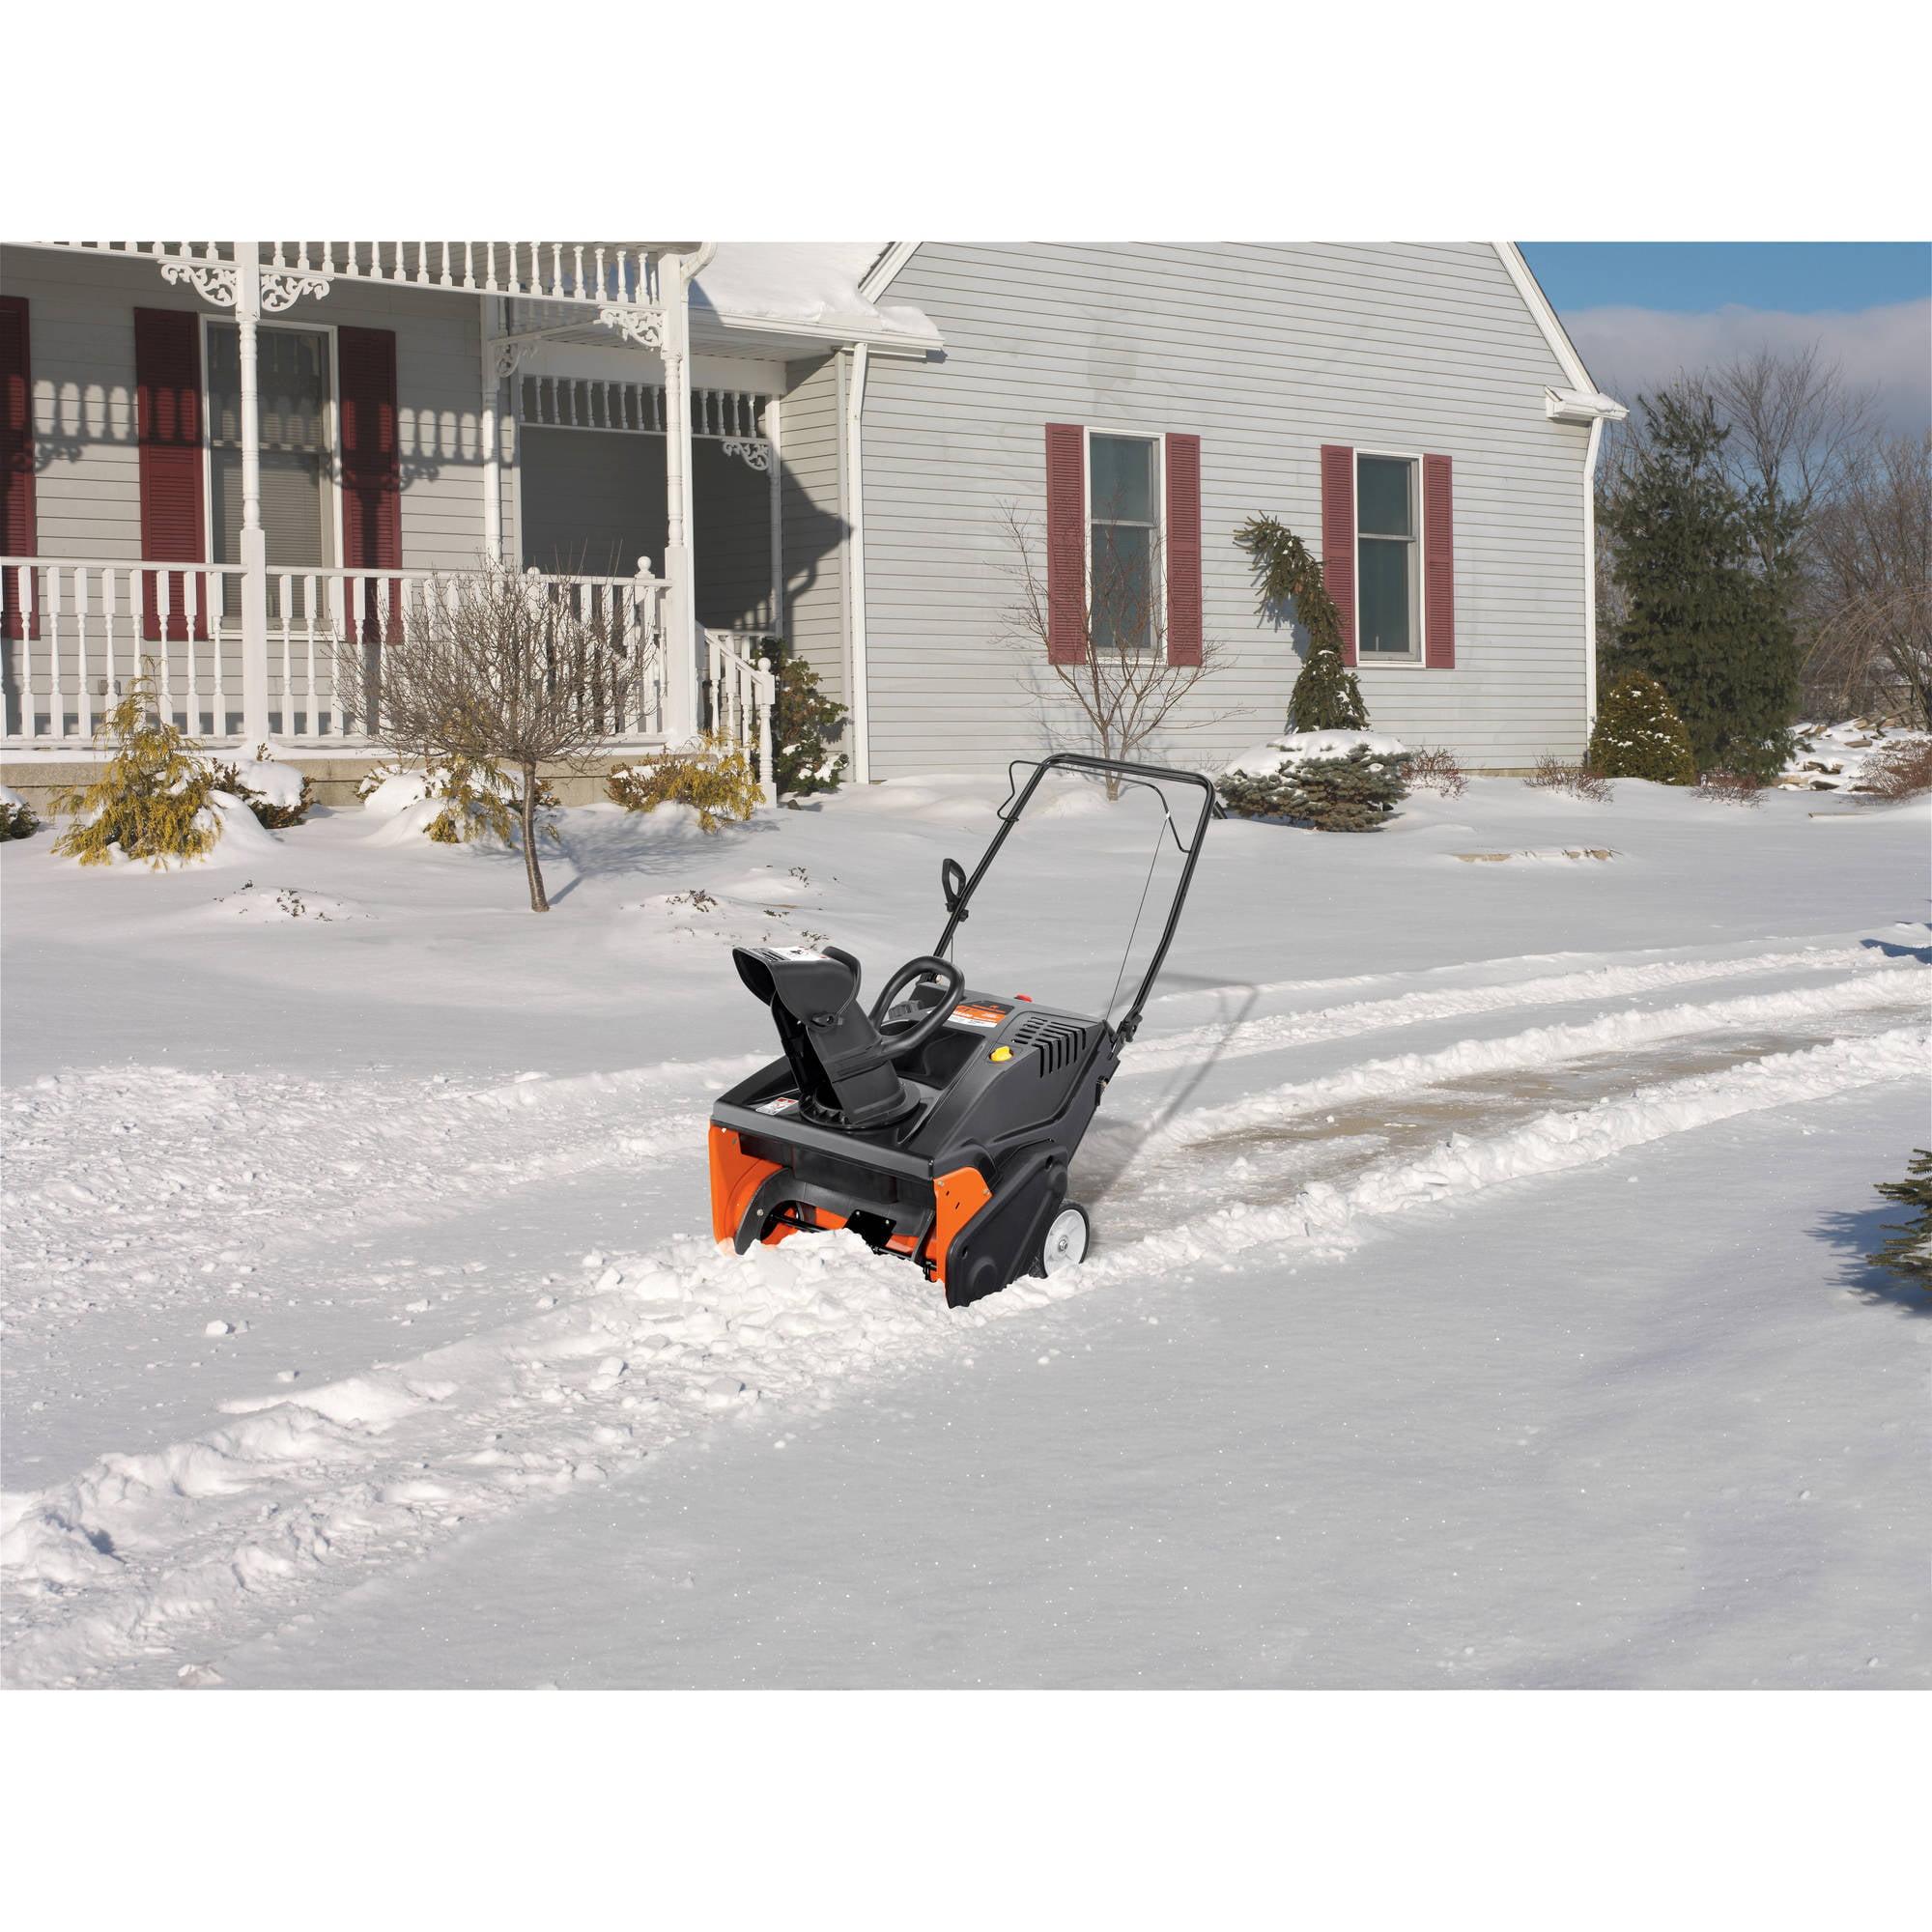 38ff20a3 16c9 41bd ba01 dab48de02de8_1.033fbd51a734d0c1e944c033fc954a55 snow blowers walmart com  at virtualis.co